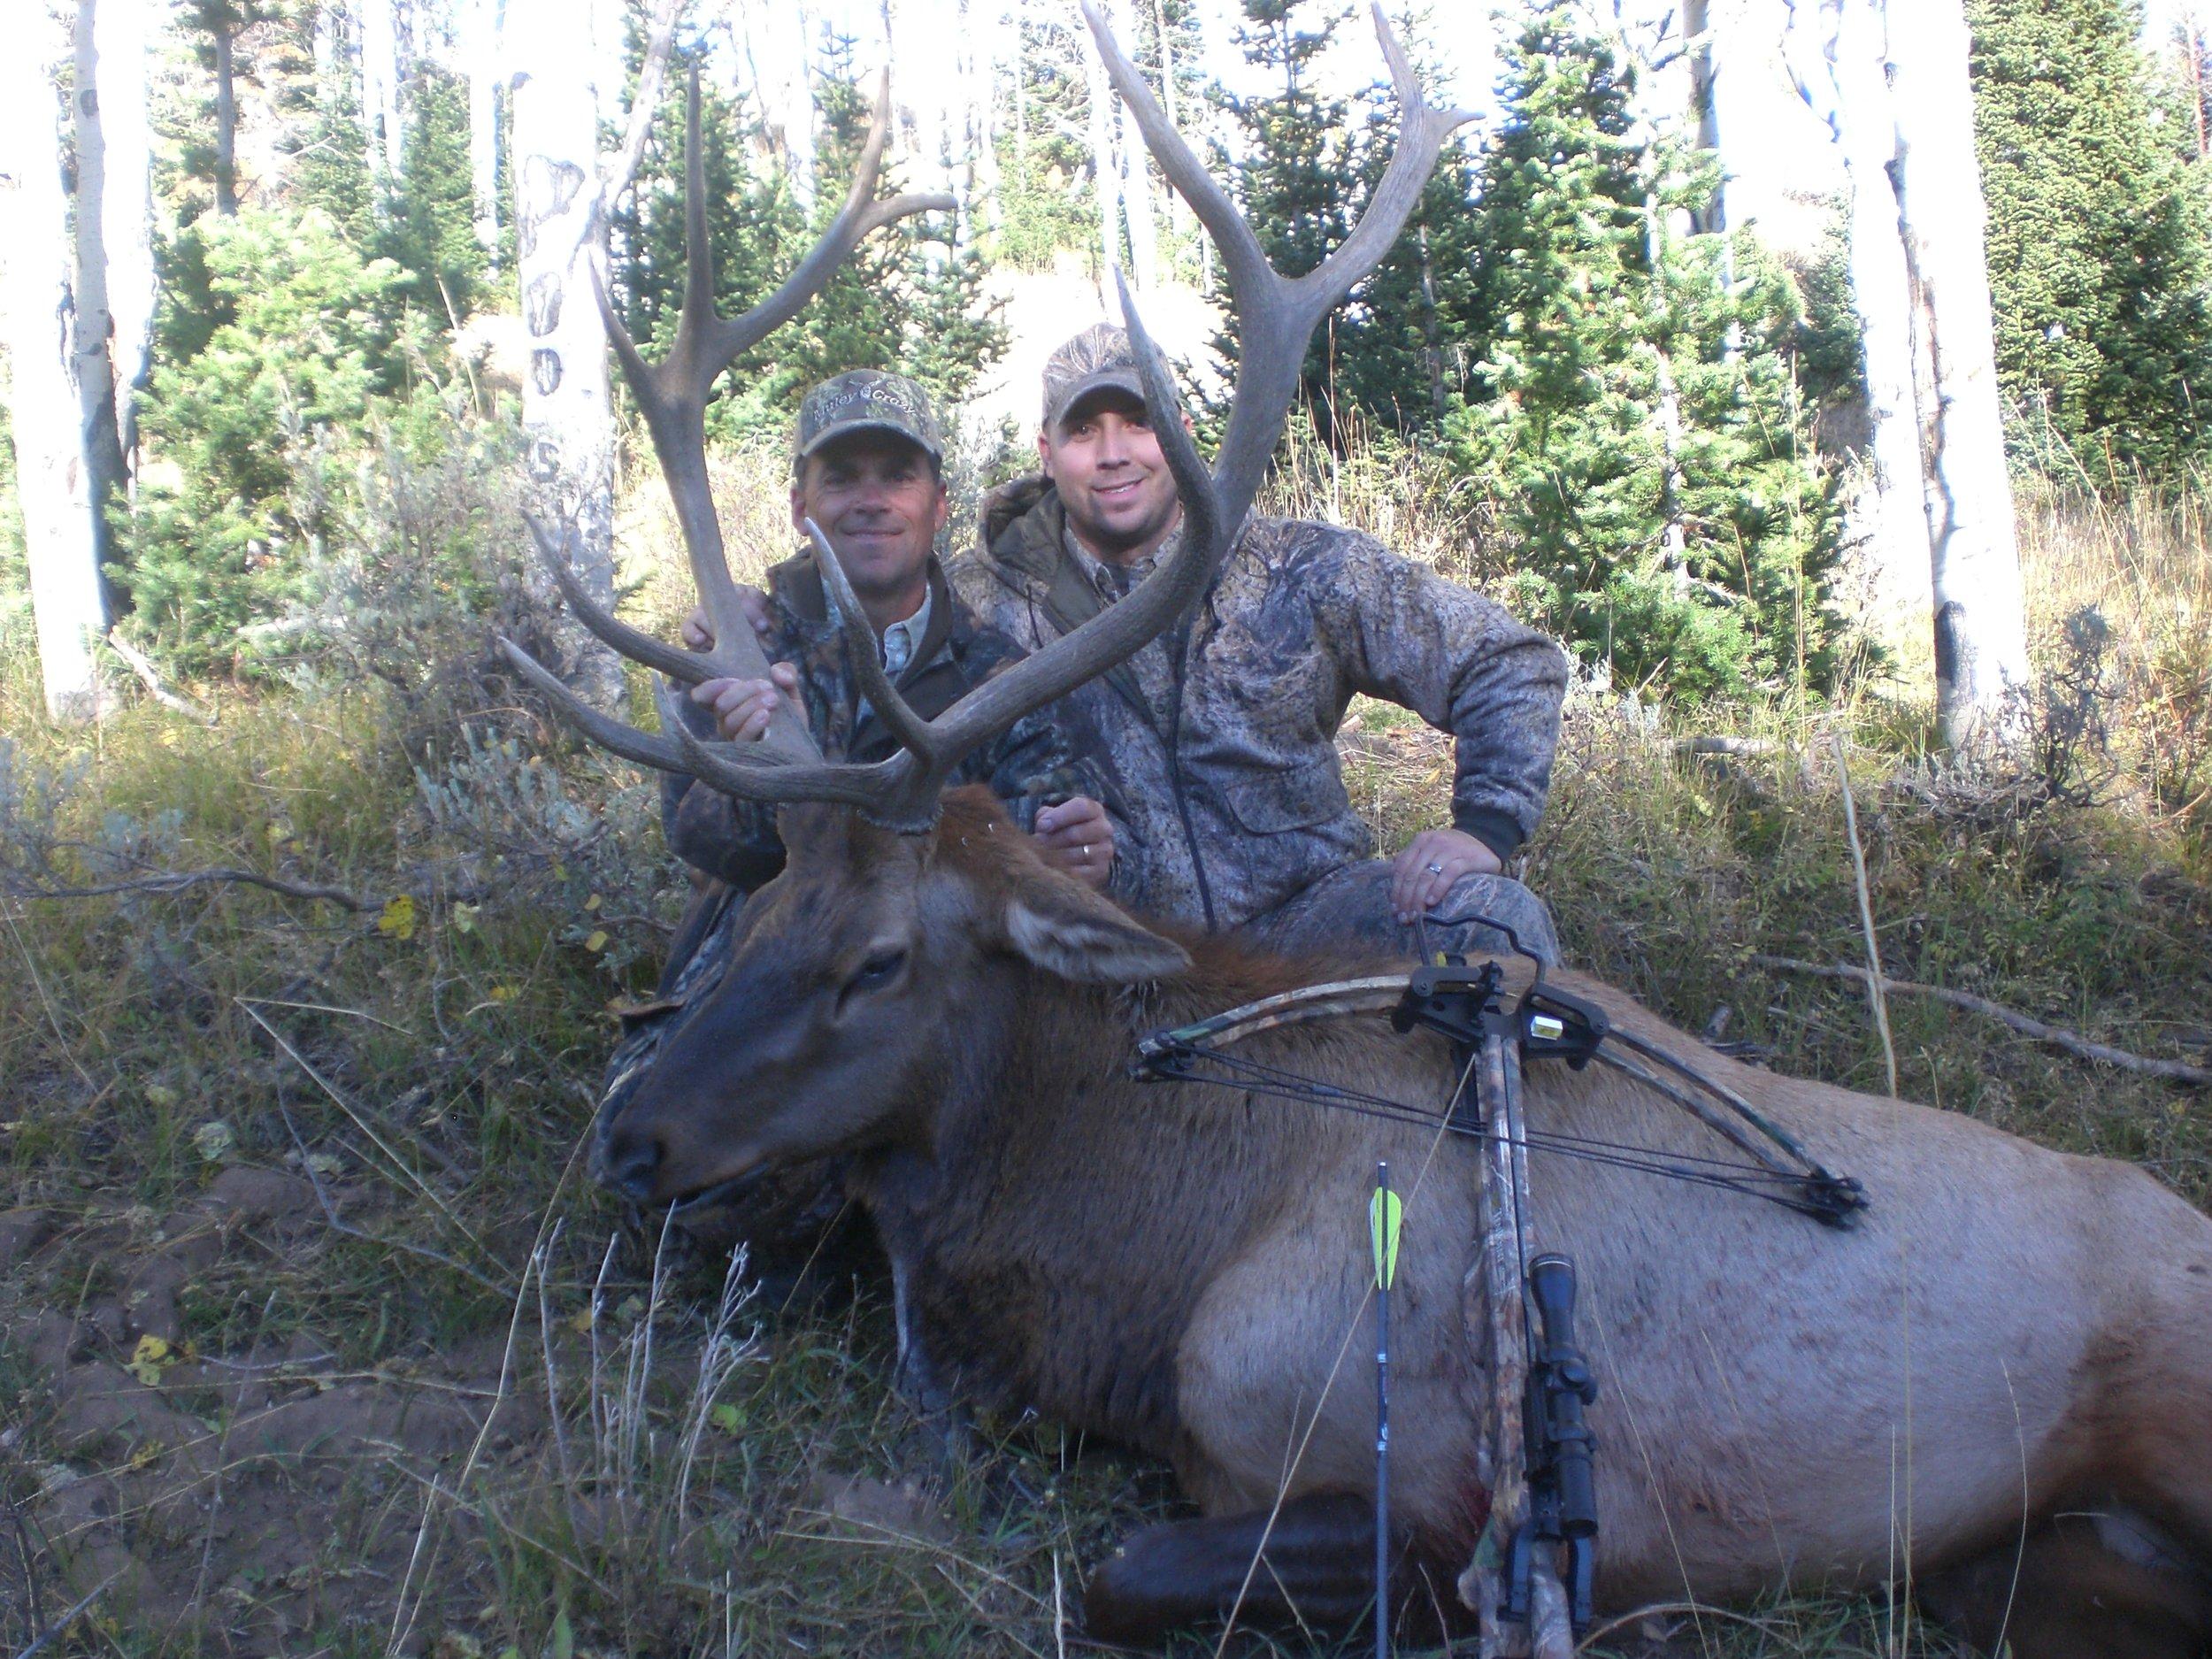 Wyoming09Elk_Little Mtns 157.jpg